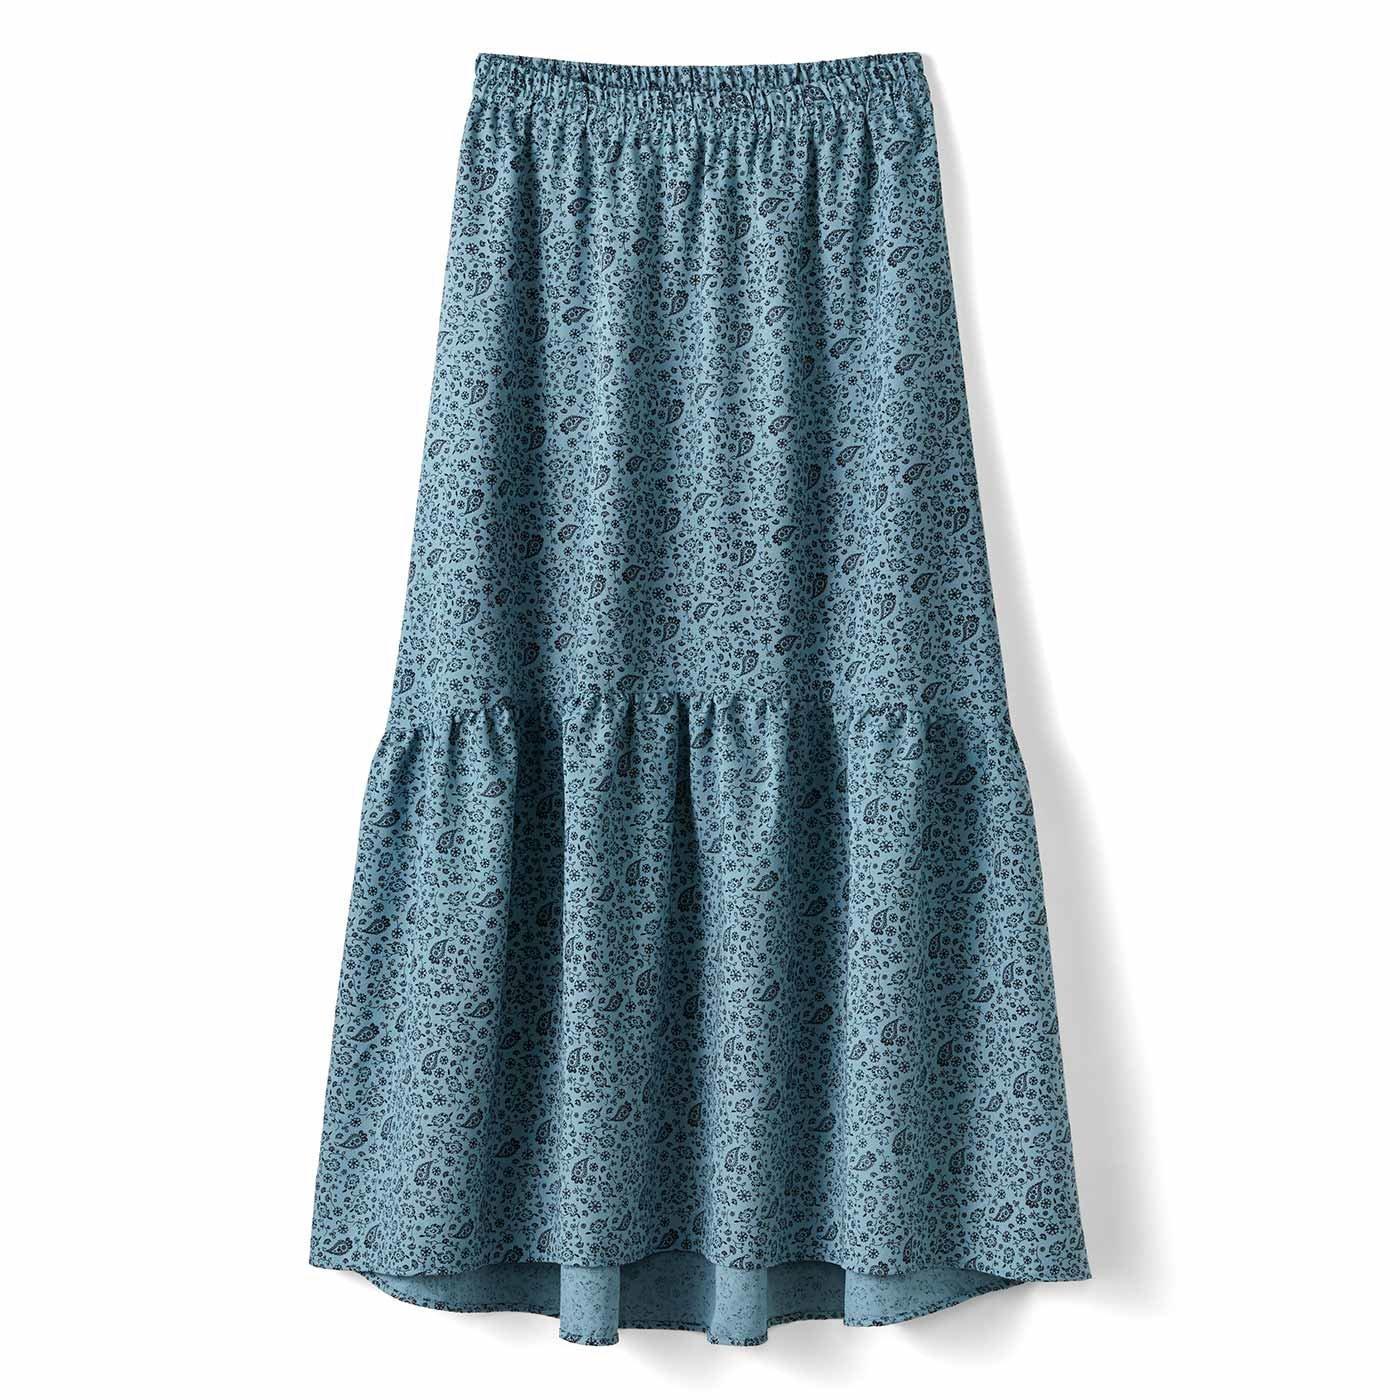 IEDIT[イディット] 福田麻琴さんコラボ 着まわし力抜群の2-WAYスカート〈グレイッシュブルー〉